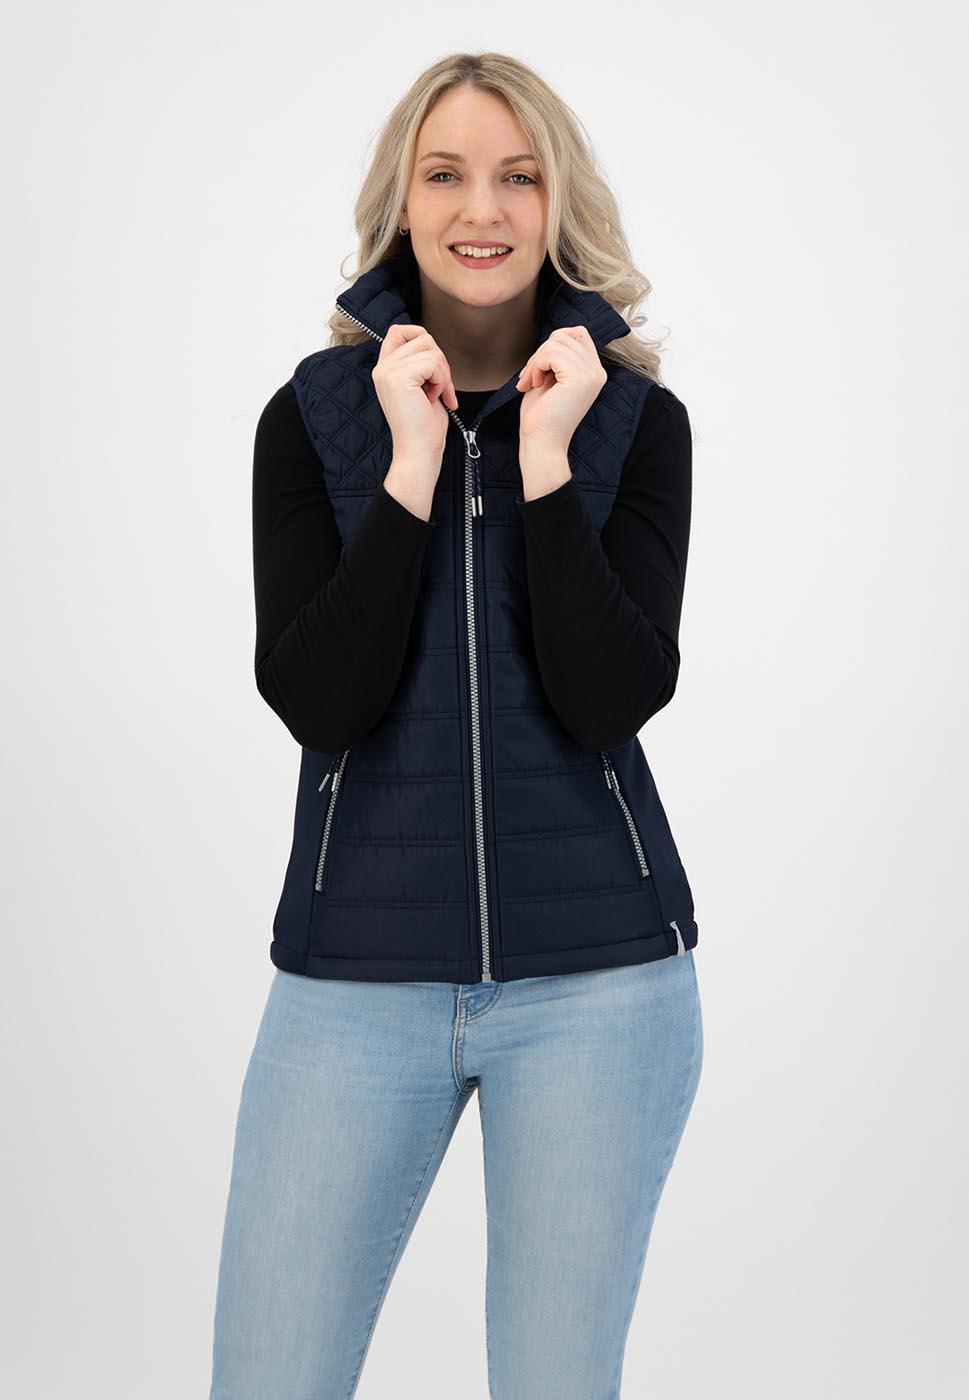 Kjelvik Scandinavian Clothing - Women Bodywarmers Patricia Navy